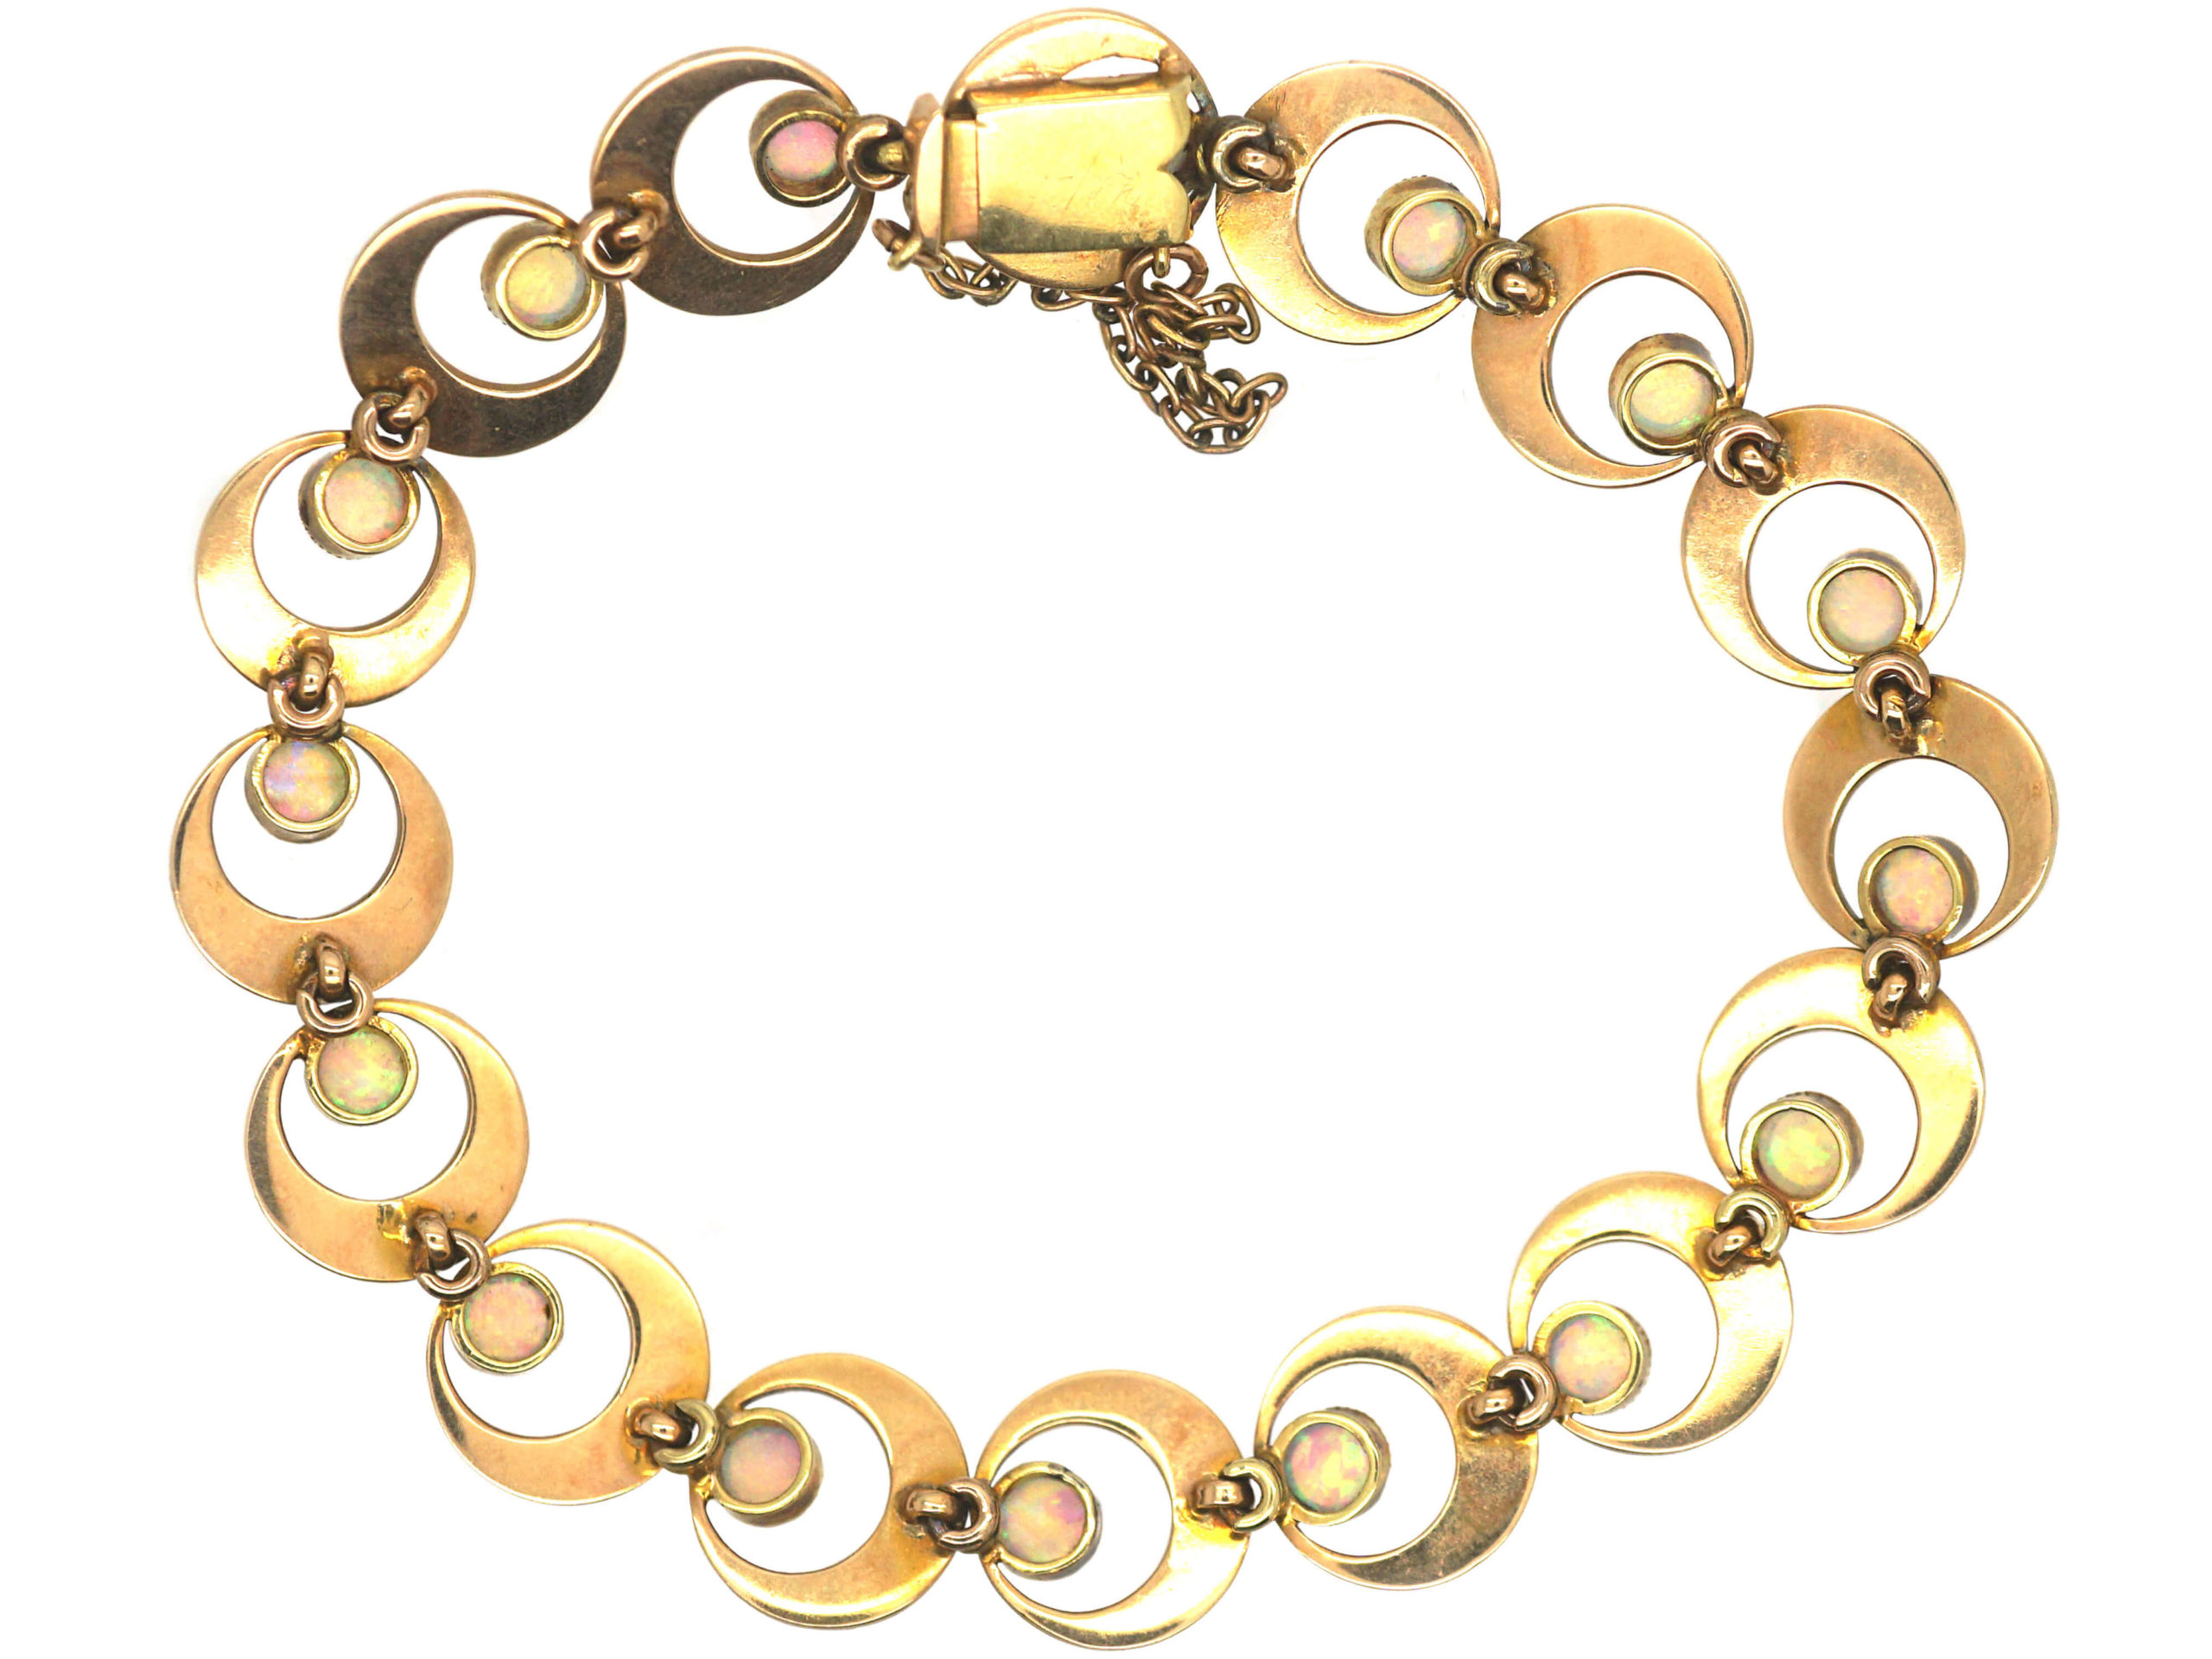 Edwardian 15ct Gold & Opal Interlinked Circles Bracelet